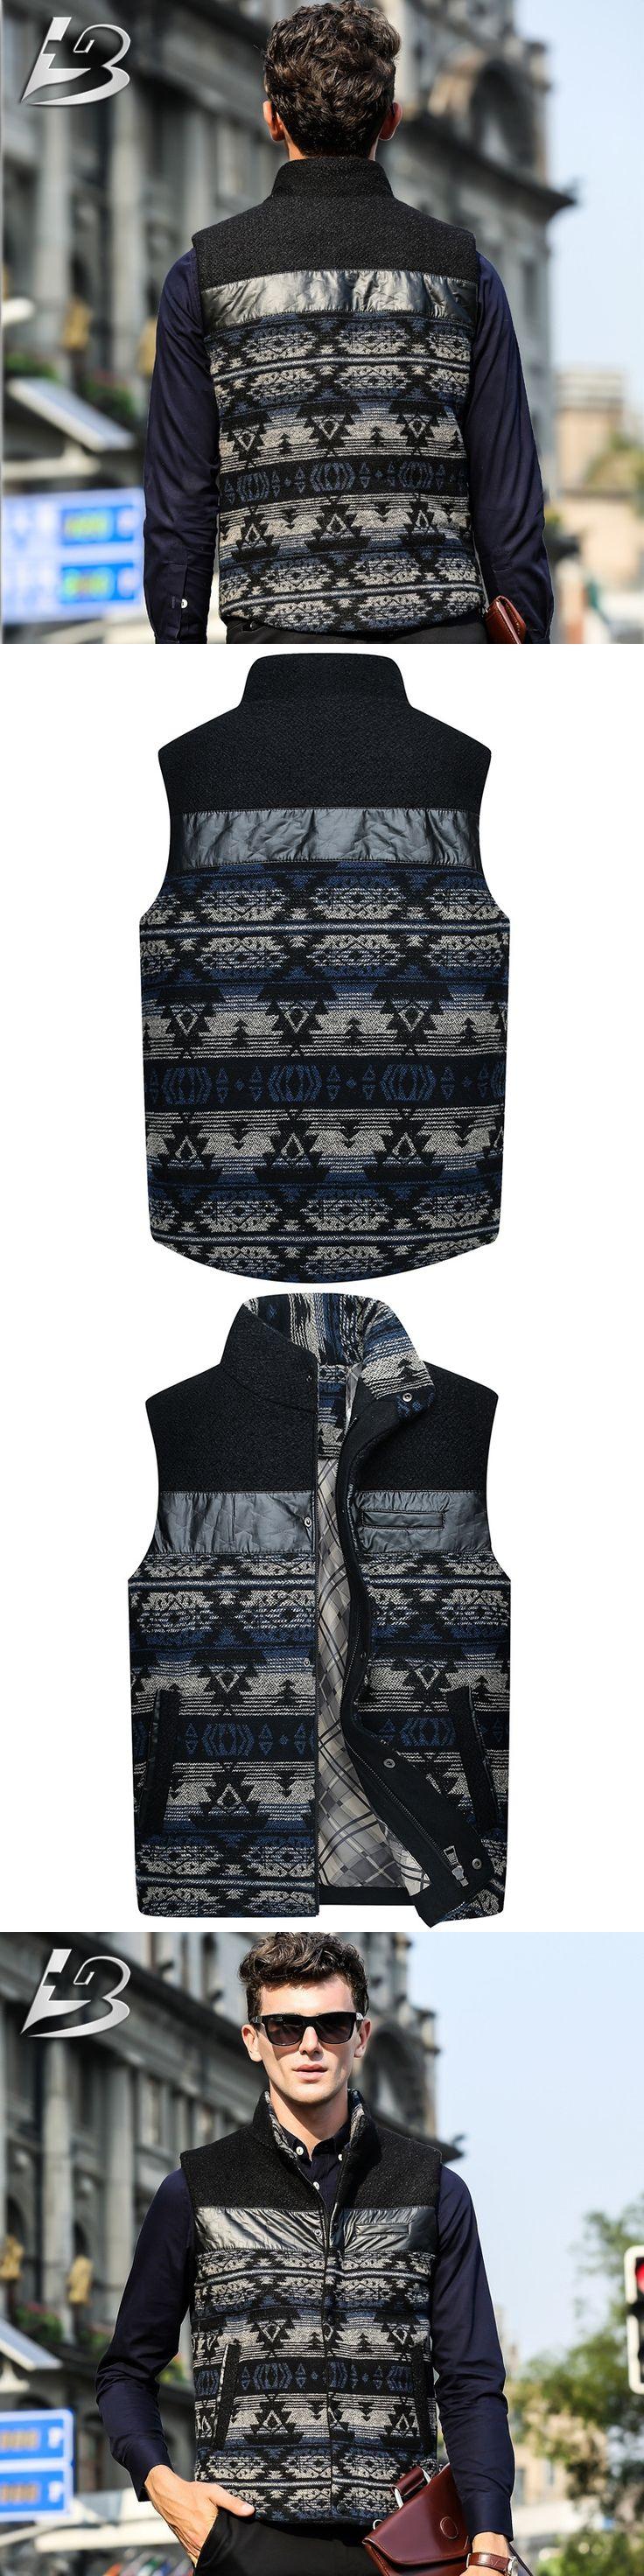 Autumn and winter men wool vest thicken casual plus size vest outwear